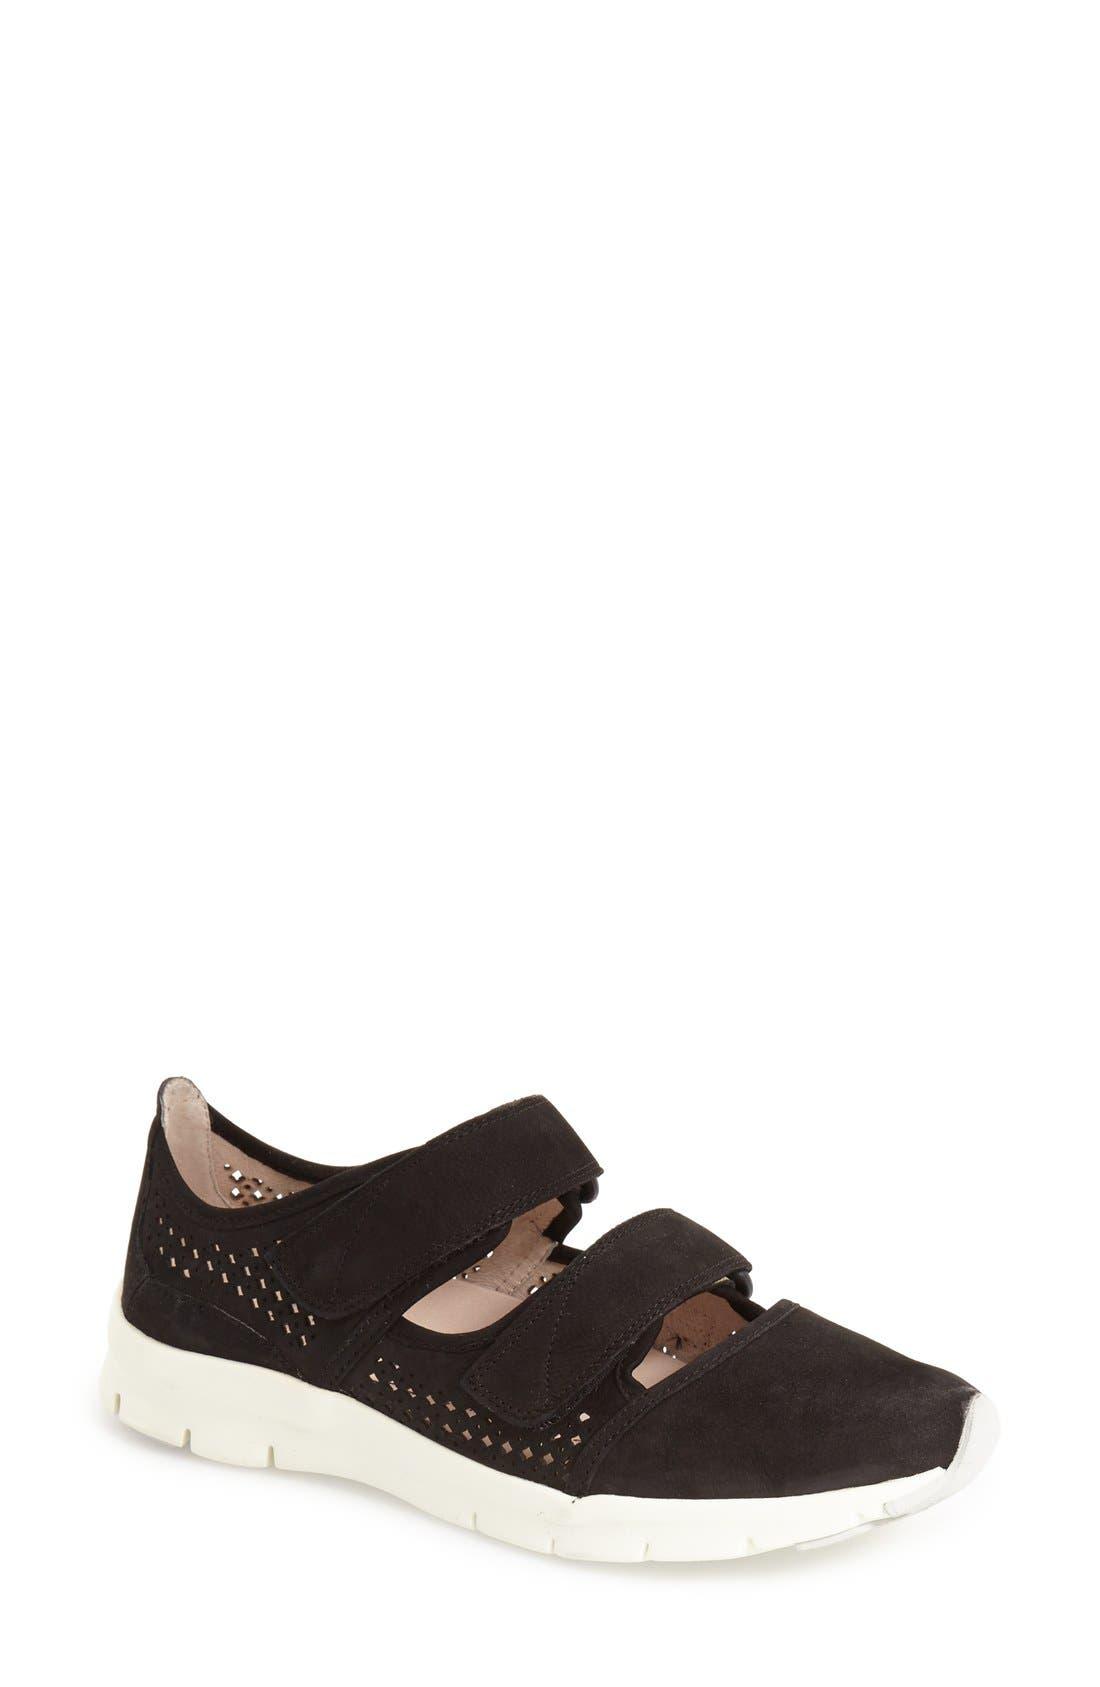 Sudini 'Tacy' Slip-On Leather Sneaker (Women)